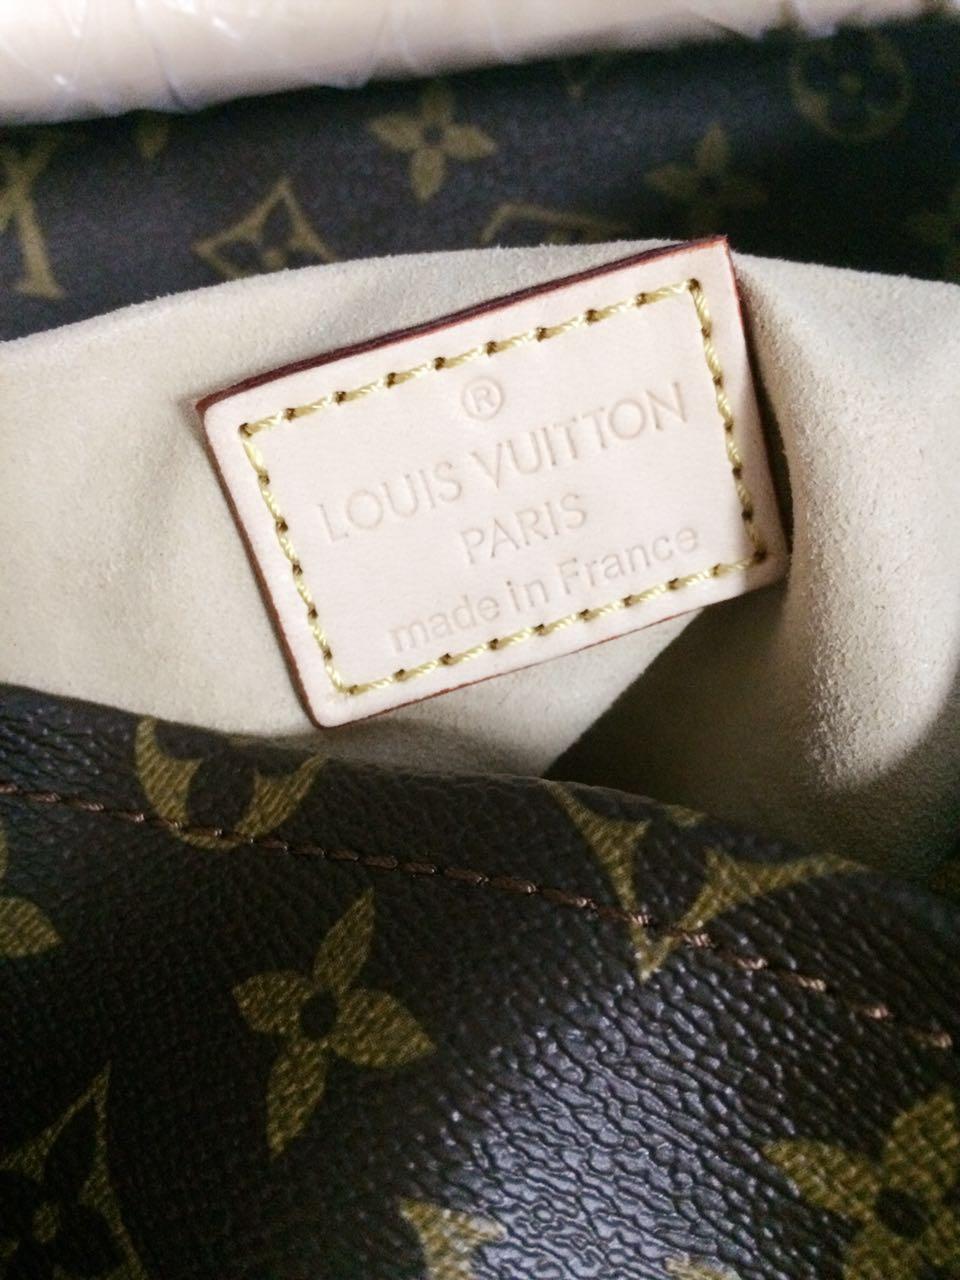 Louis Vuitton Artsy Mm Monogram Canvas Replica Review Authentic Replica Bags Handbags